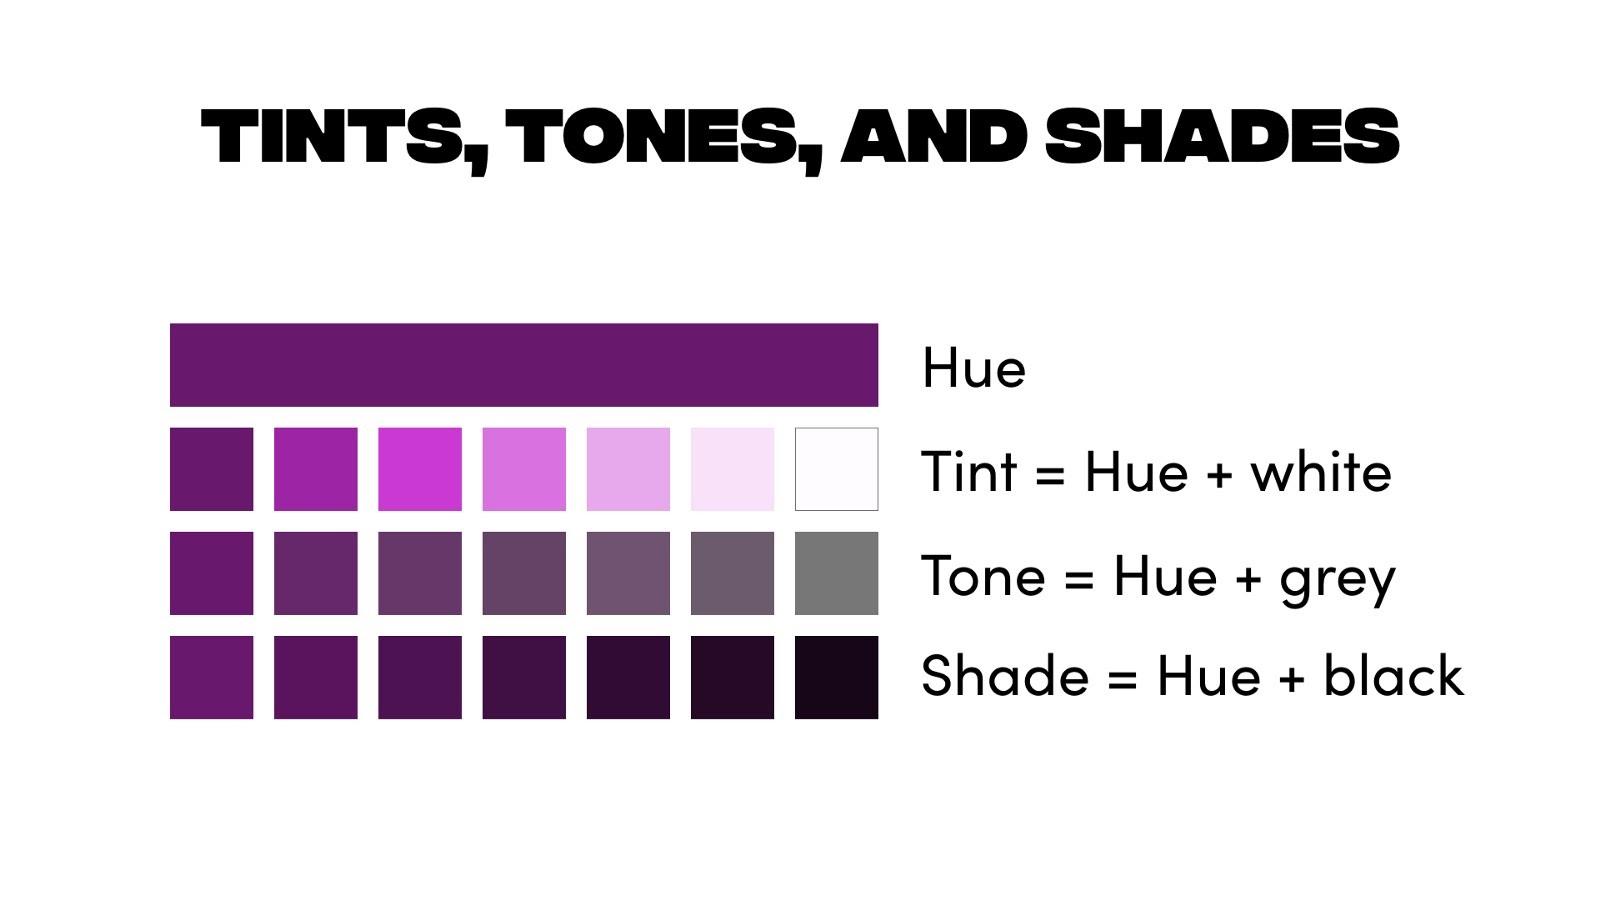 Tints, tones, and shades